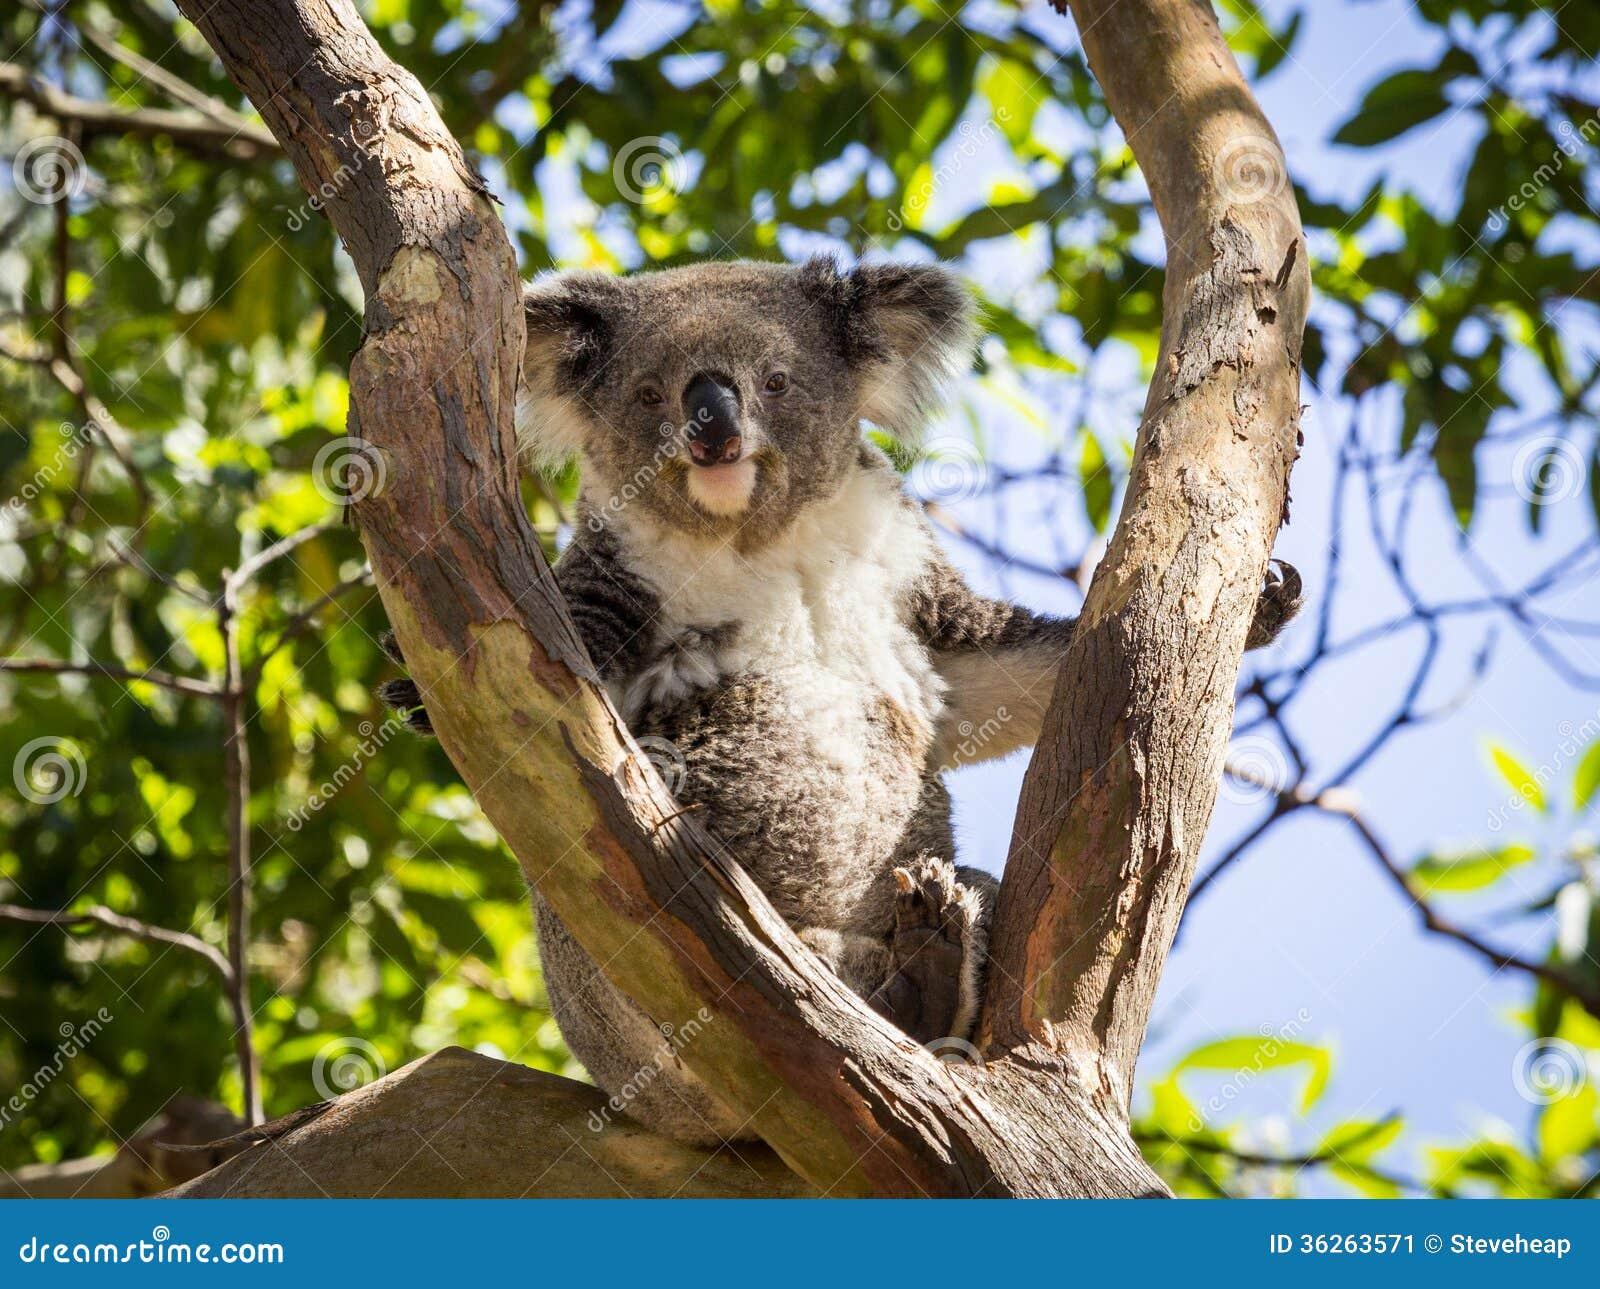 [Aventura]: Os Escolhidos - Página 6 Close-up-koala-bear-tree-australian-seated-resting-zoo-looking-towards-camera-hint-smile-its-cute-36263571